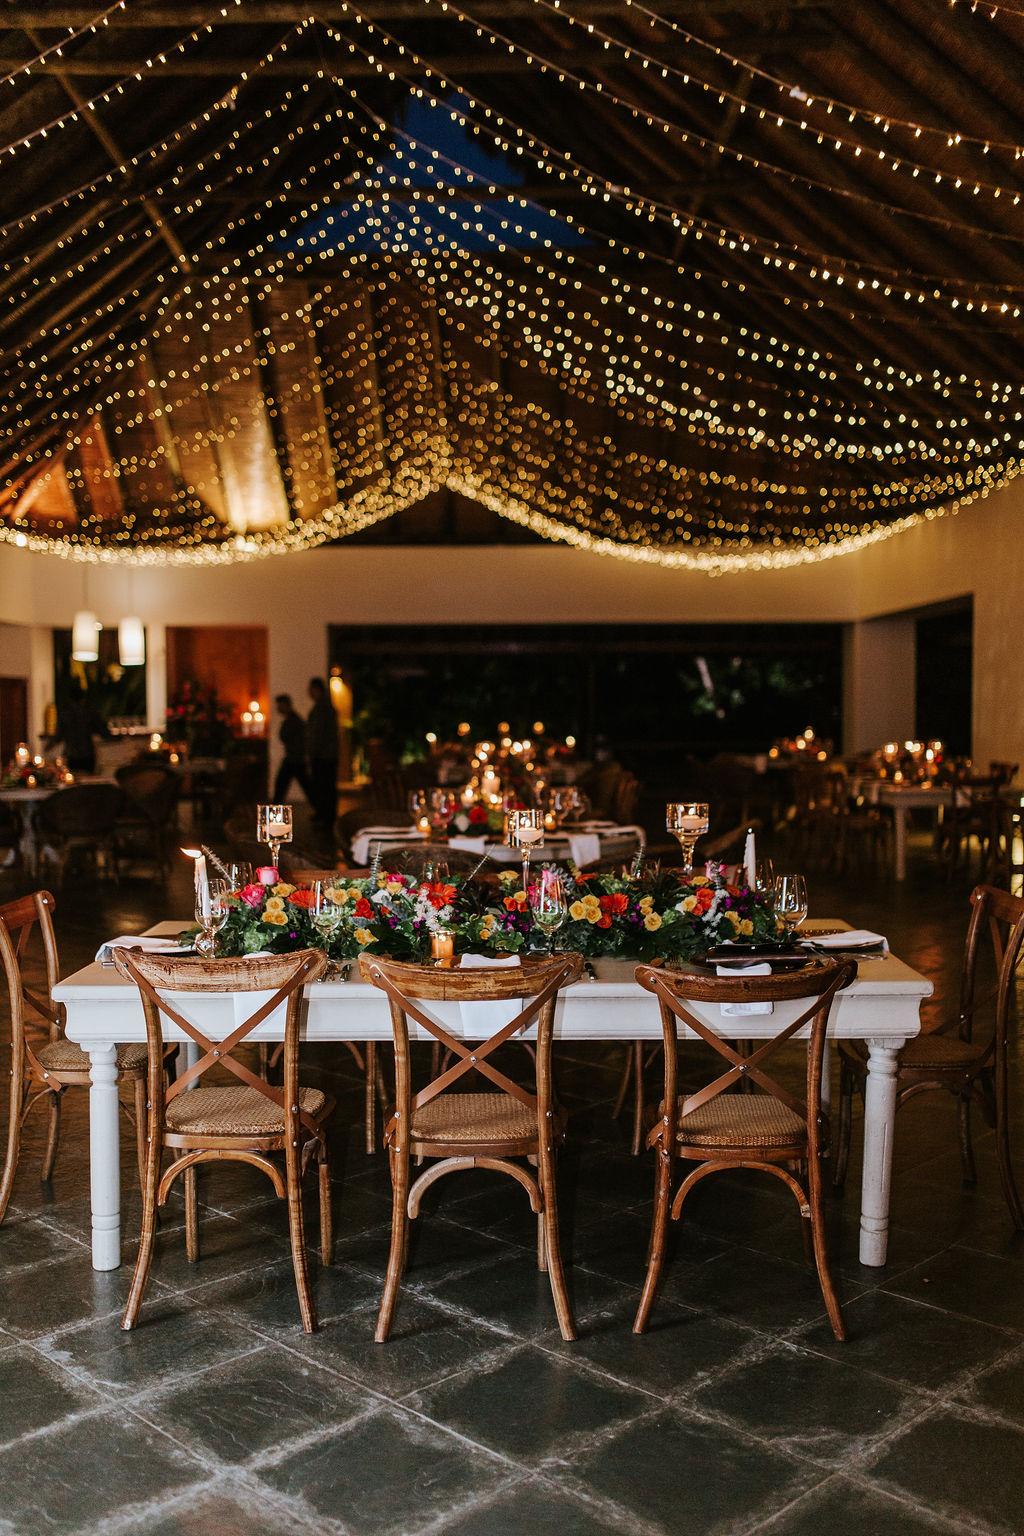 julieth-bravo-wedding-planner-destino-mecasoencolombia-cartagena-wedding-destination-decoracion-miami-destino.jpg